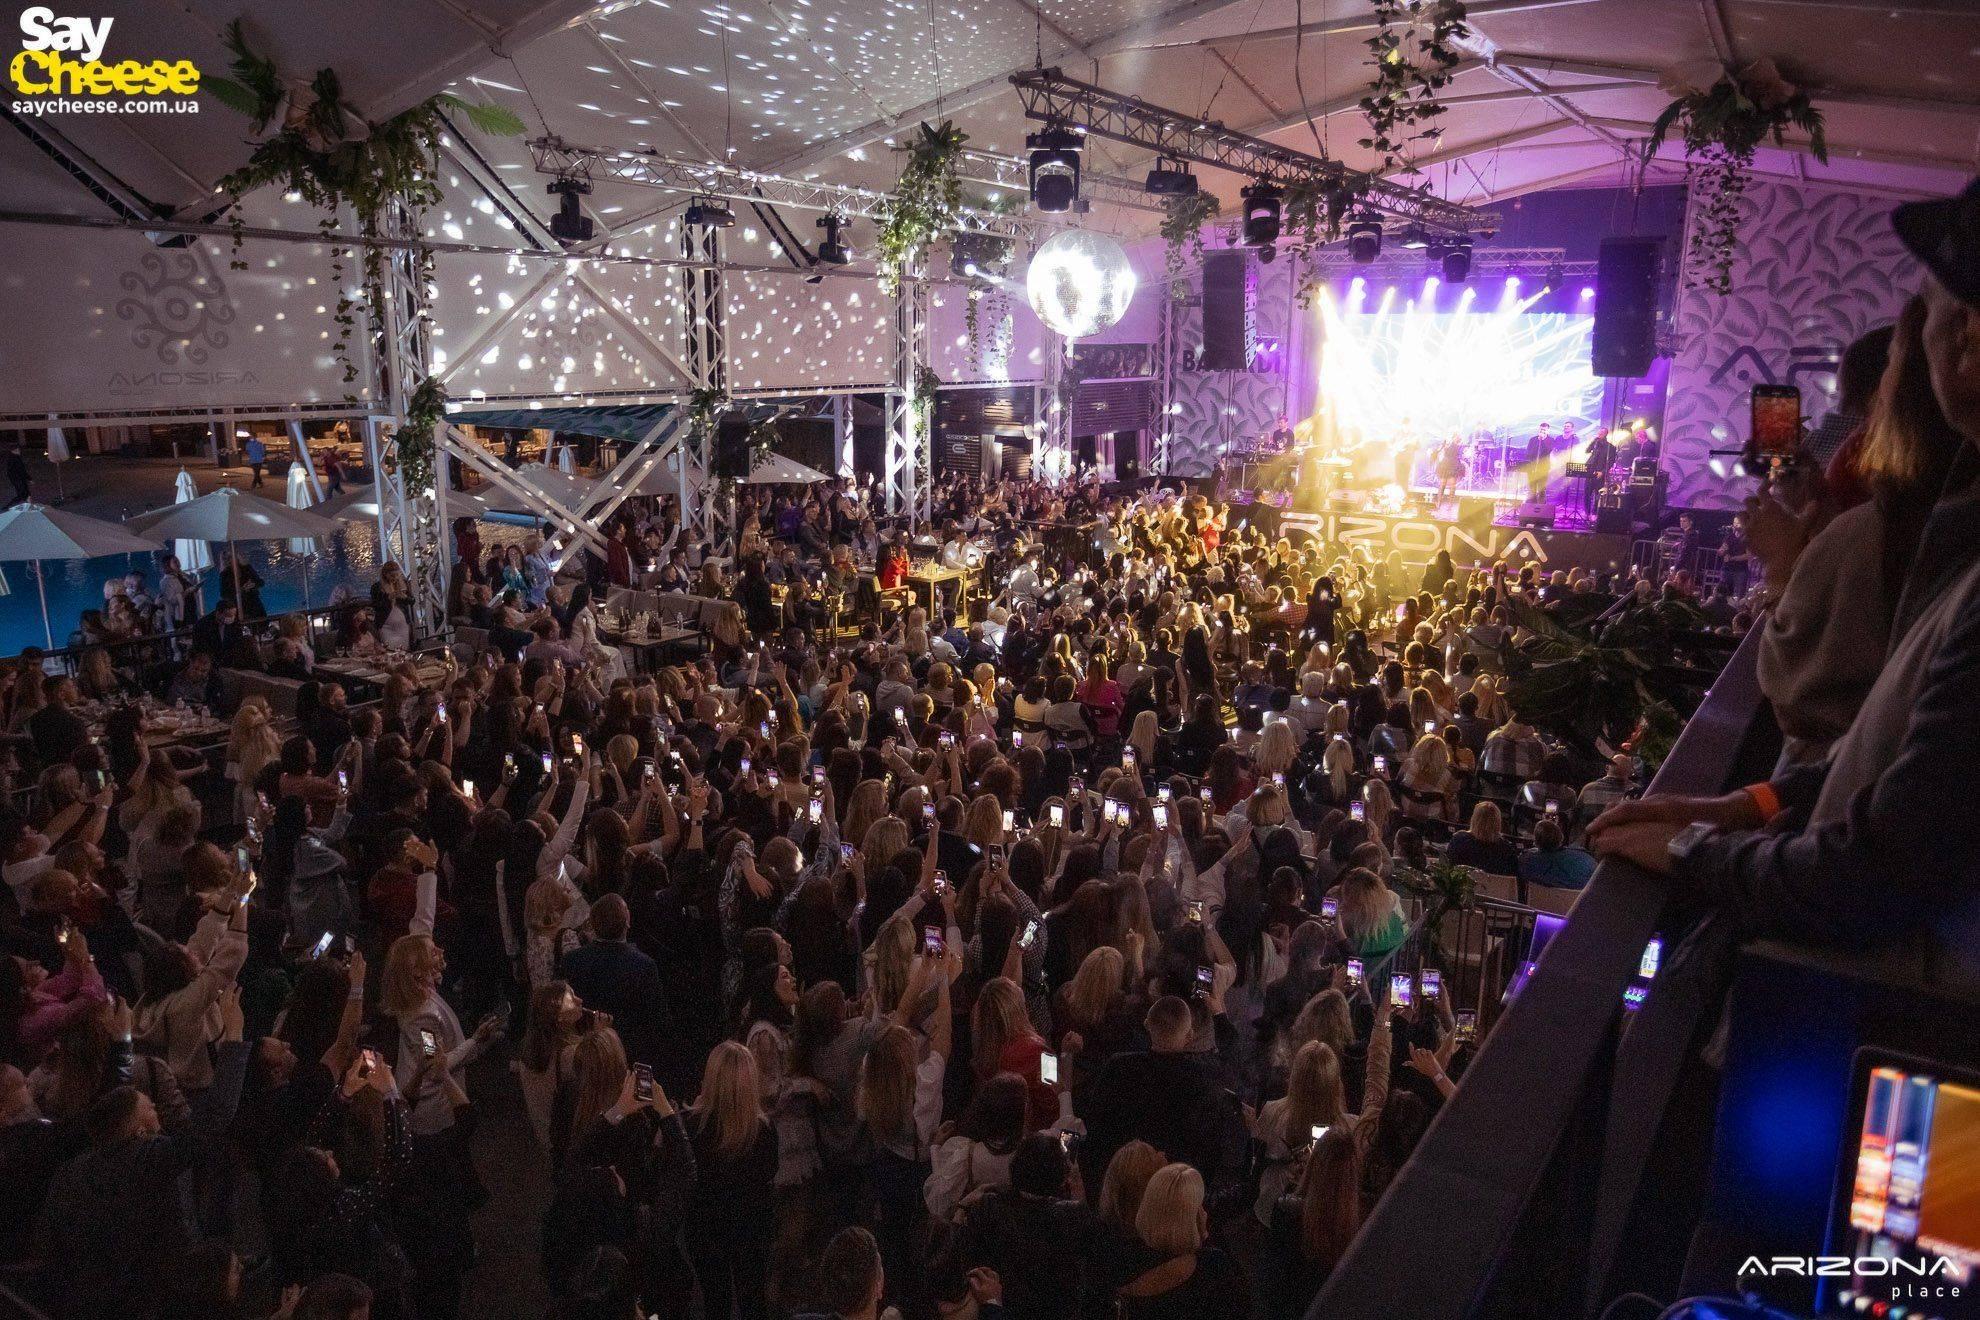 12-06 Arizona Place — Концерт Любови Успенской фотоотчет Saycheese